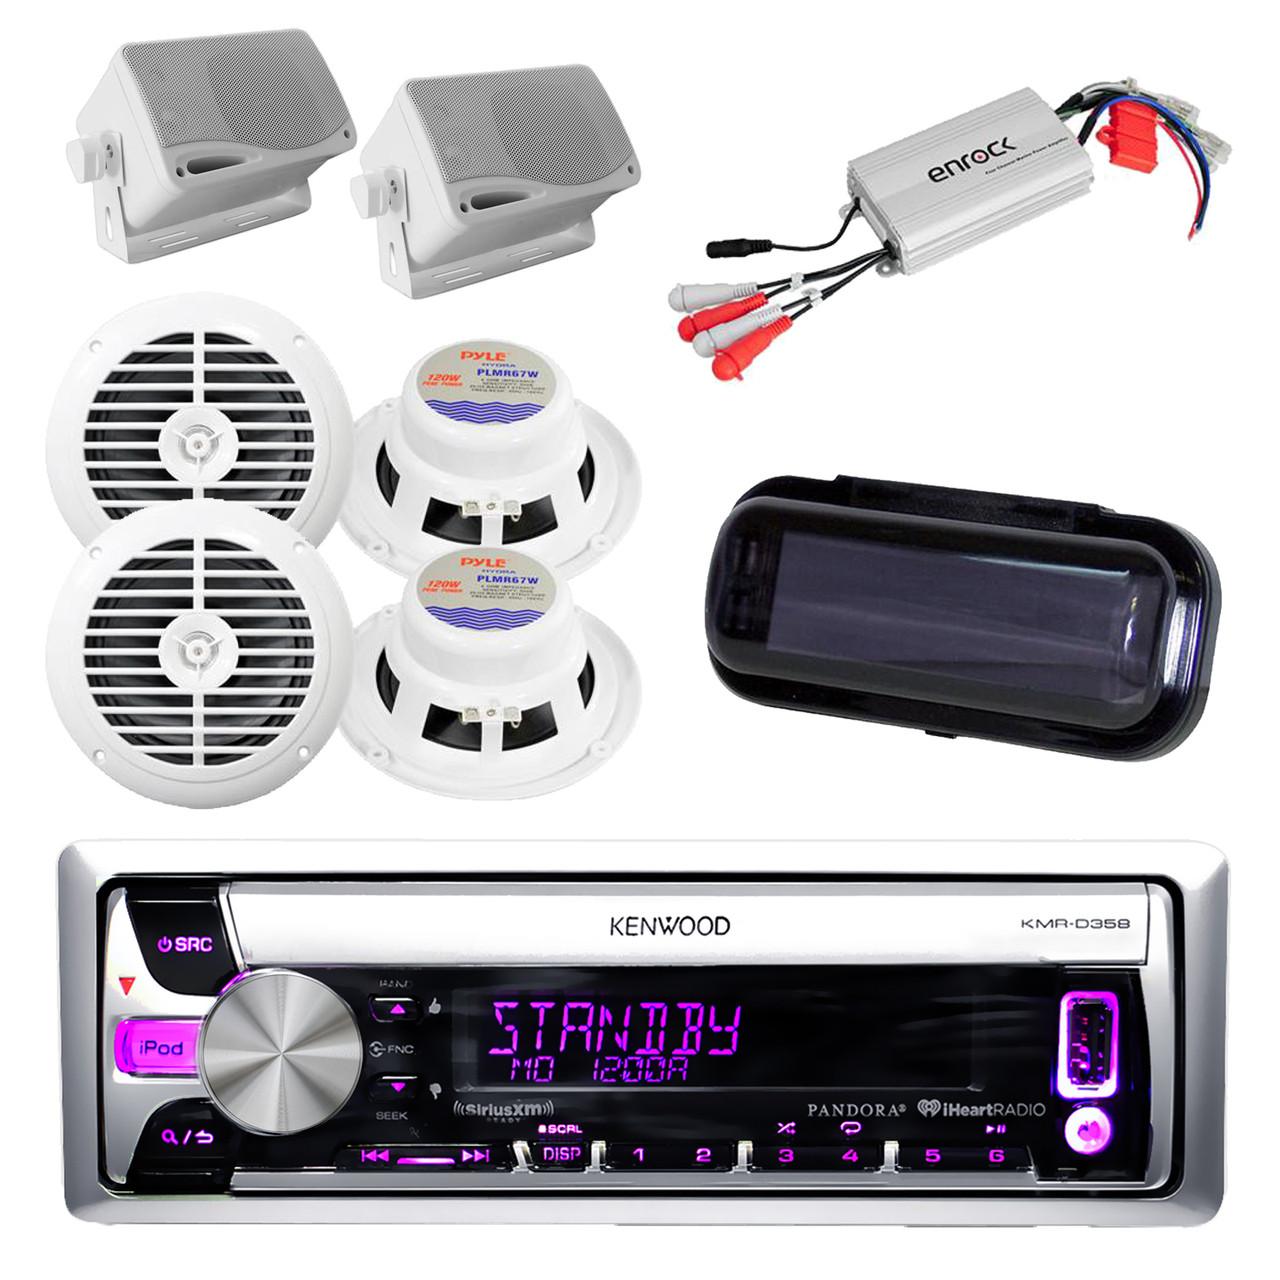 kenwood kmr d358 cd aux usb radio w white round box speakers  [ 1280 x 1280 Pixel ]